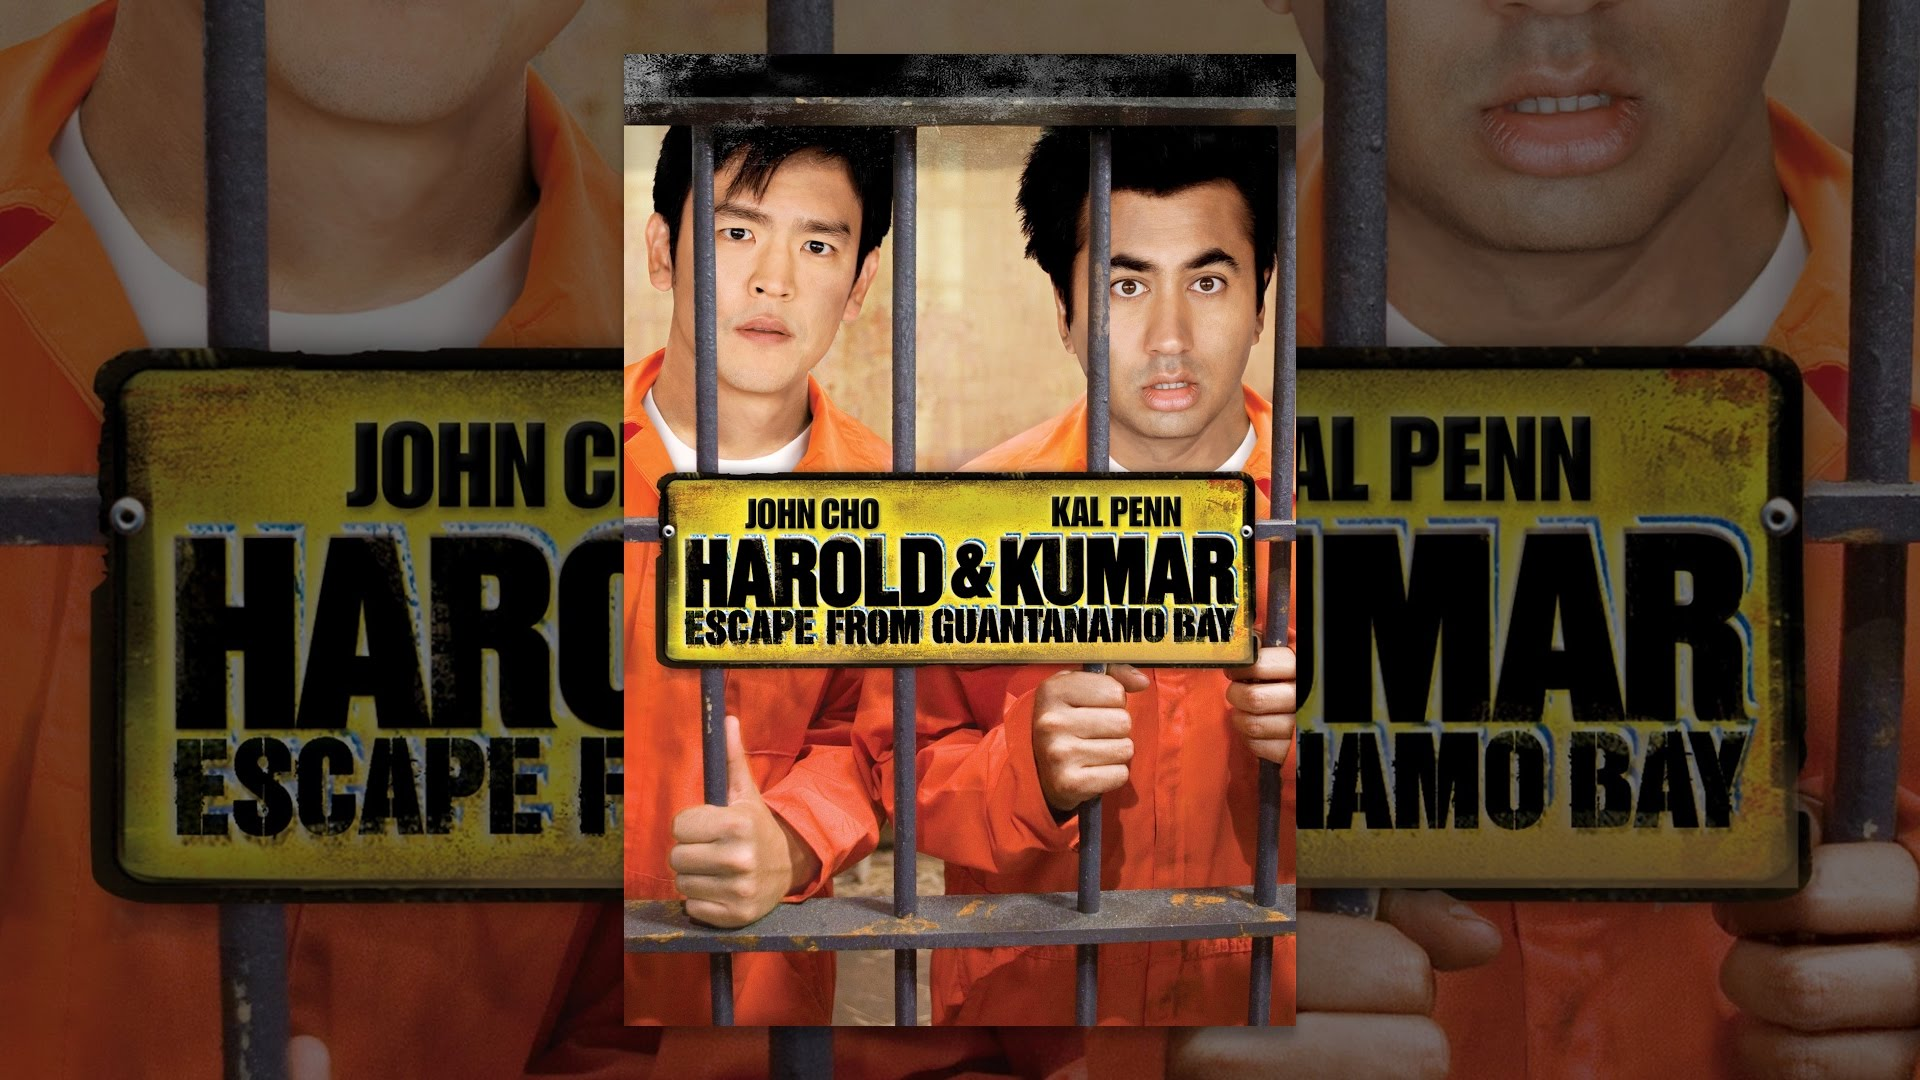 Harold And Kumar Escape From Guantanamo Bay Full Movie Free harold and kumar escape from guantanamo bay